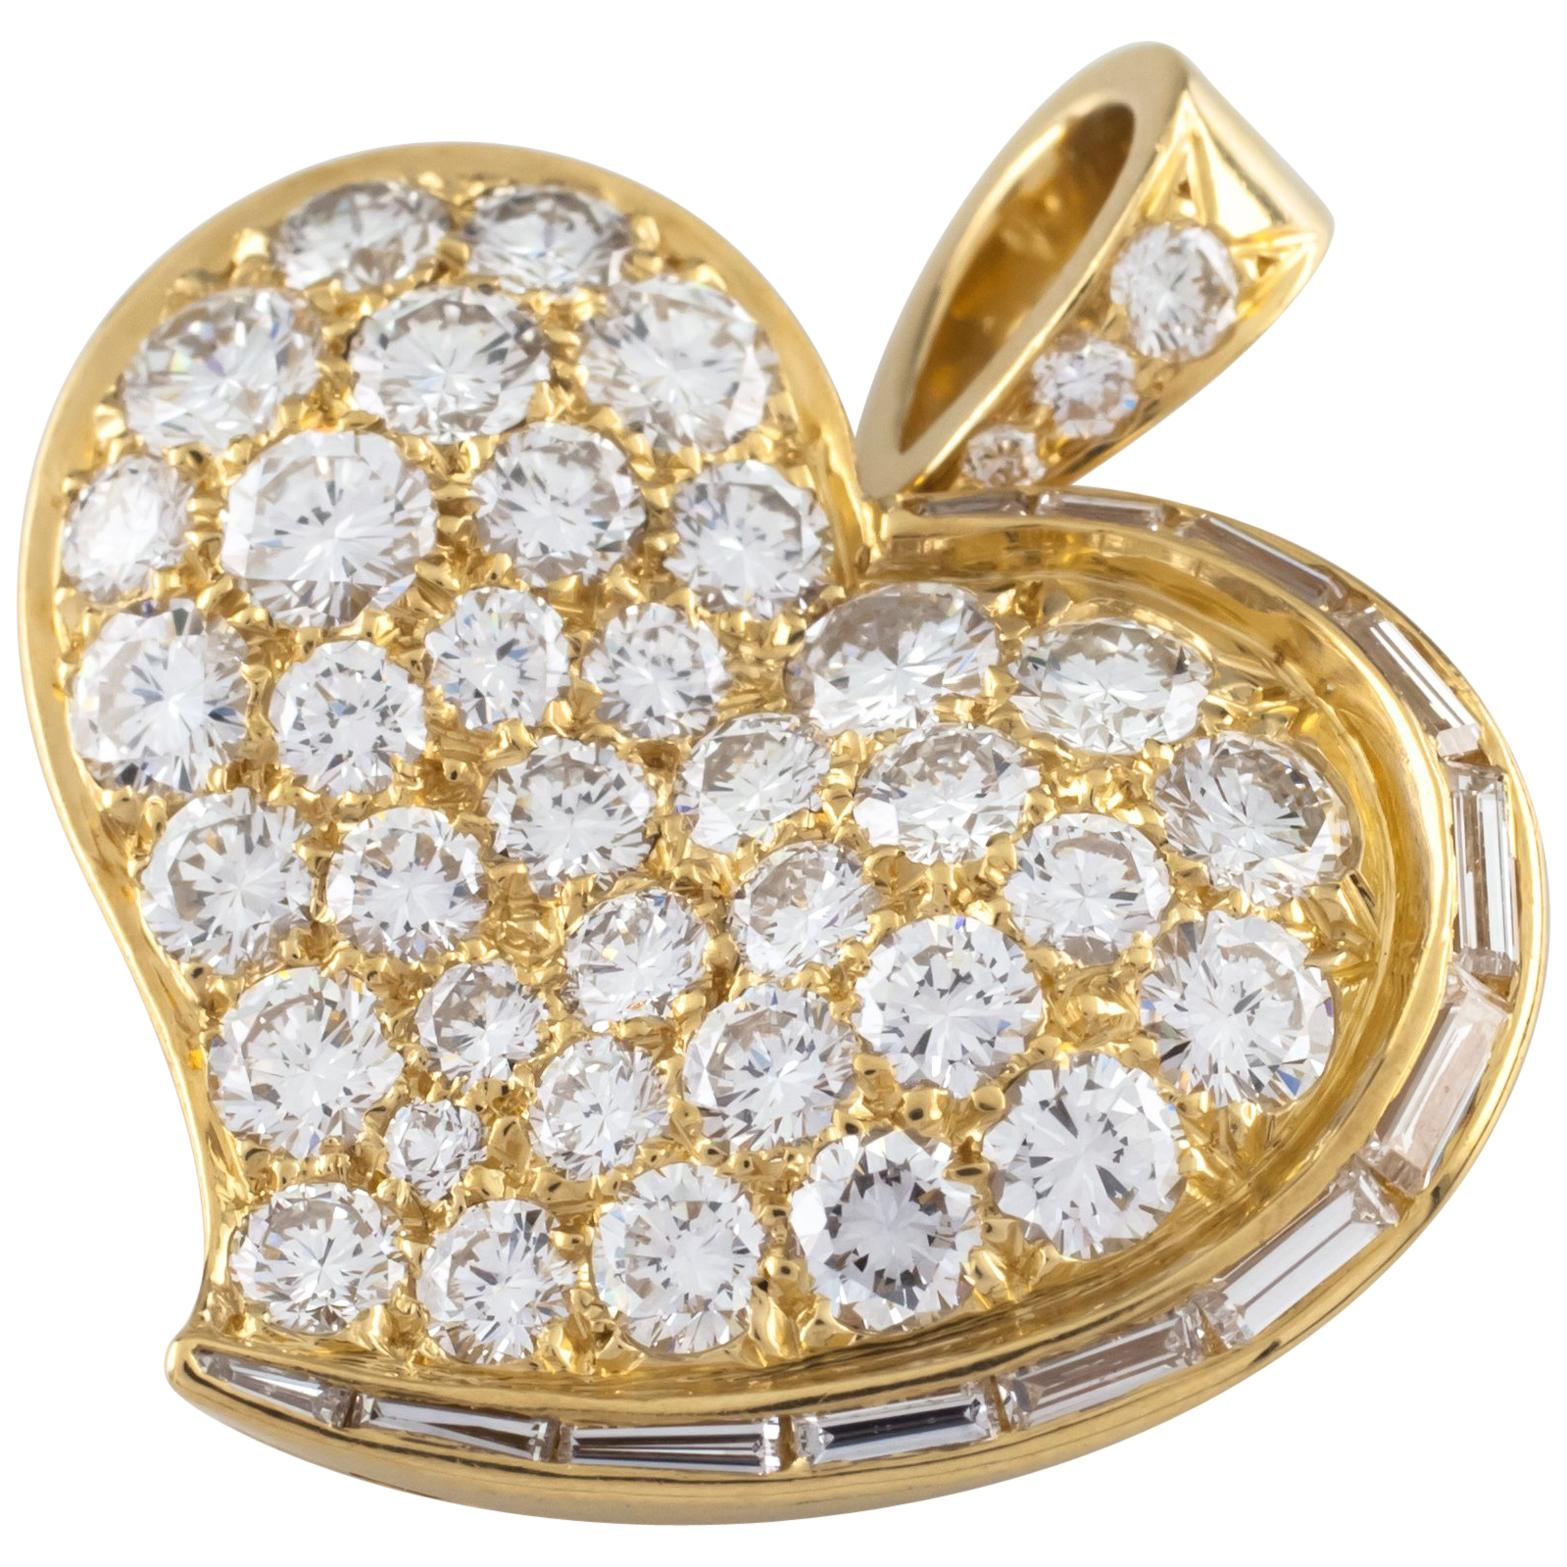 Bulgari Bvlgari 20 Karat Yellow Gold Diamond Heart Pendant